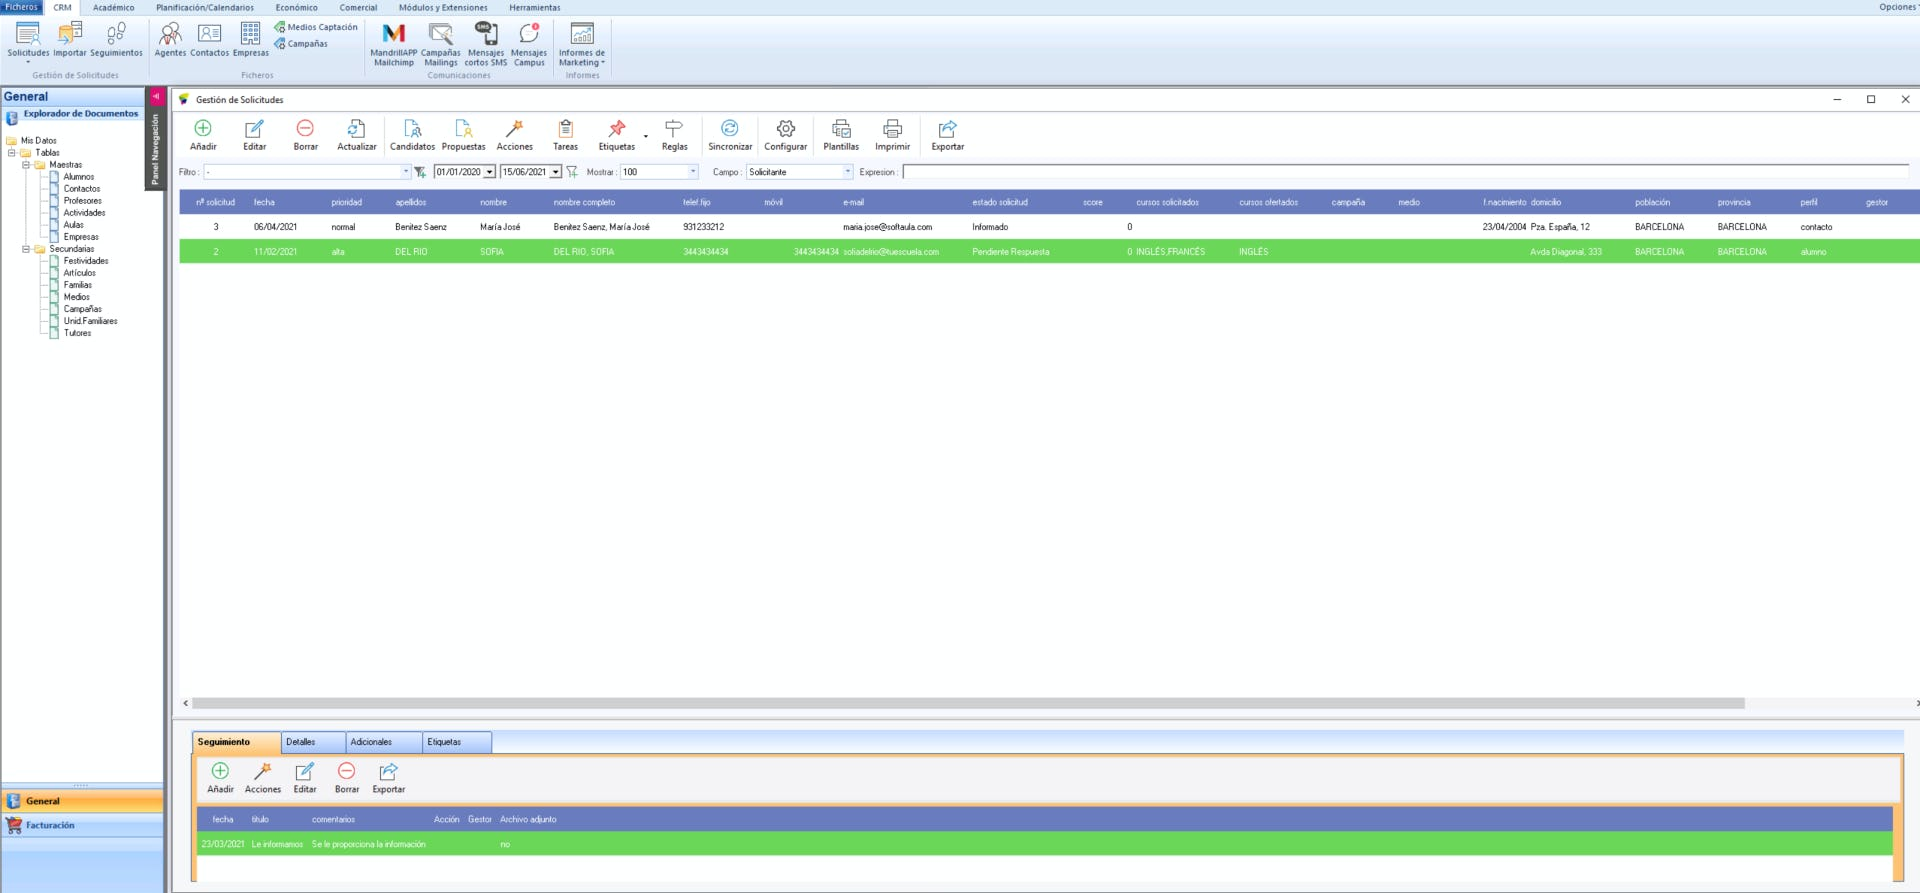 SOFTAULA Software - 2